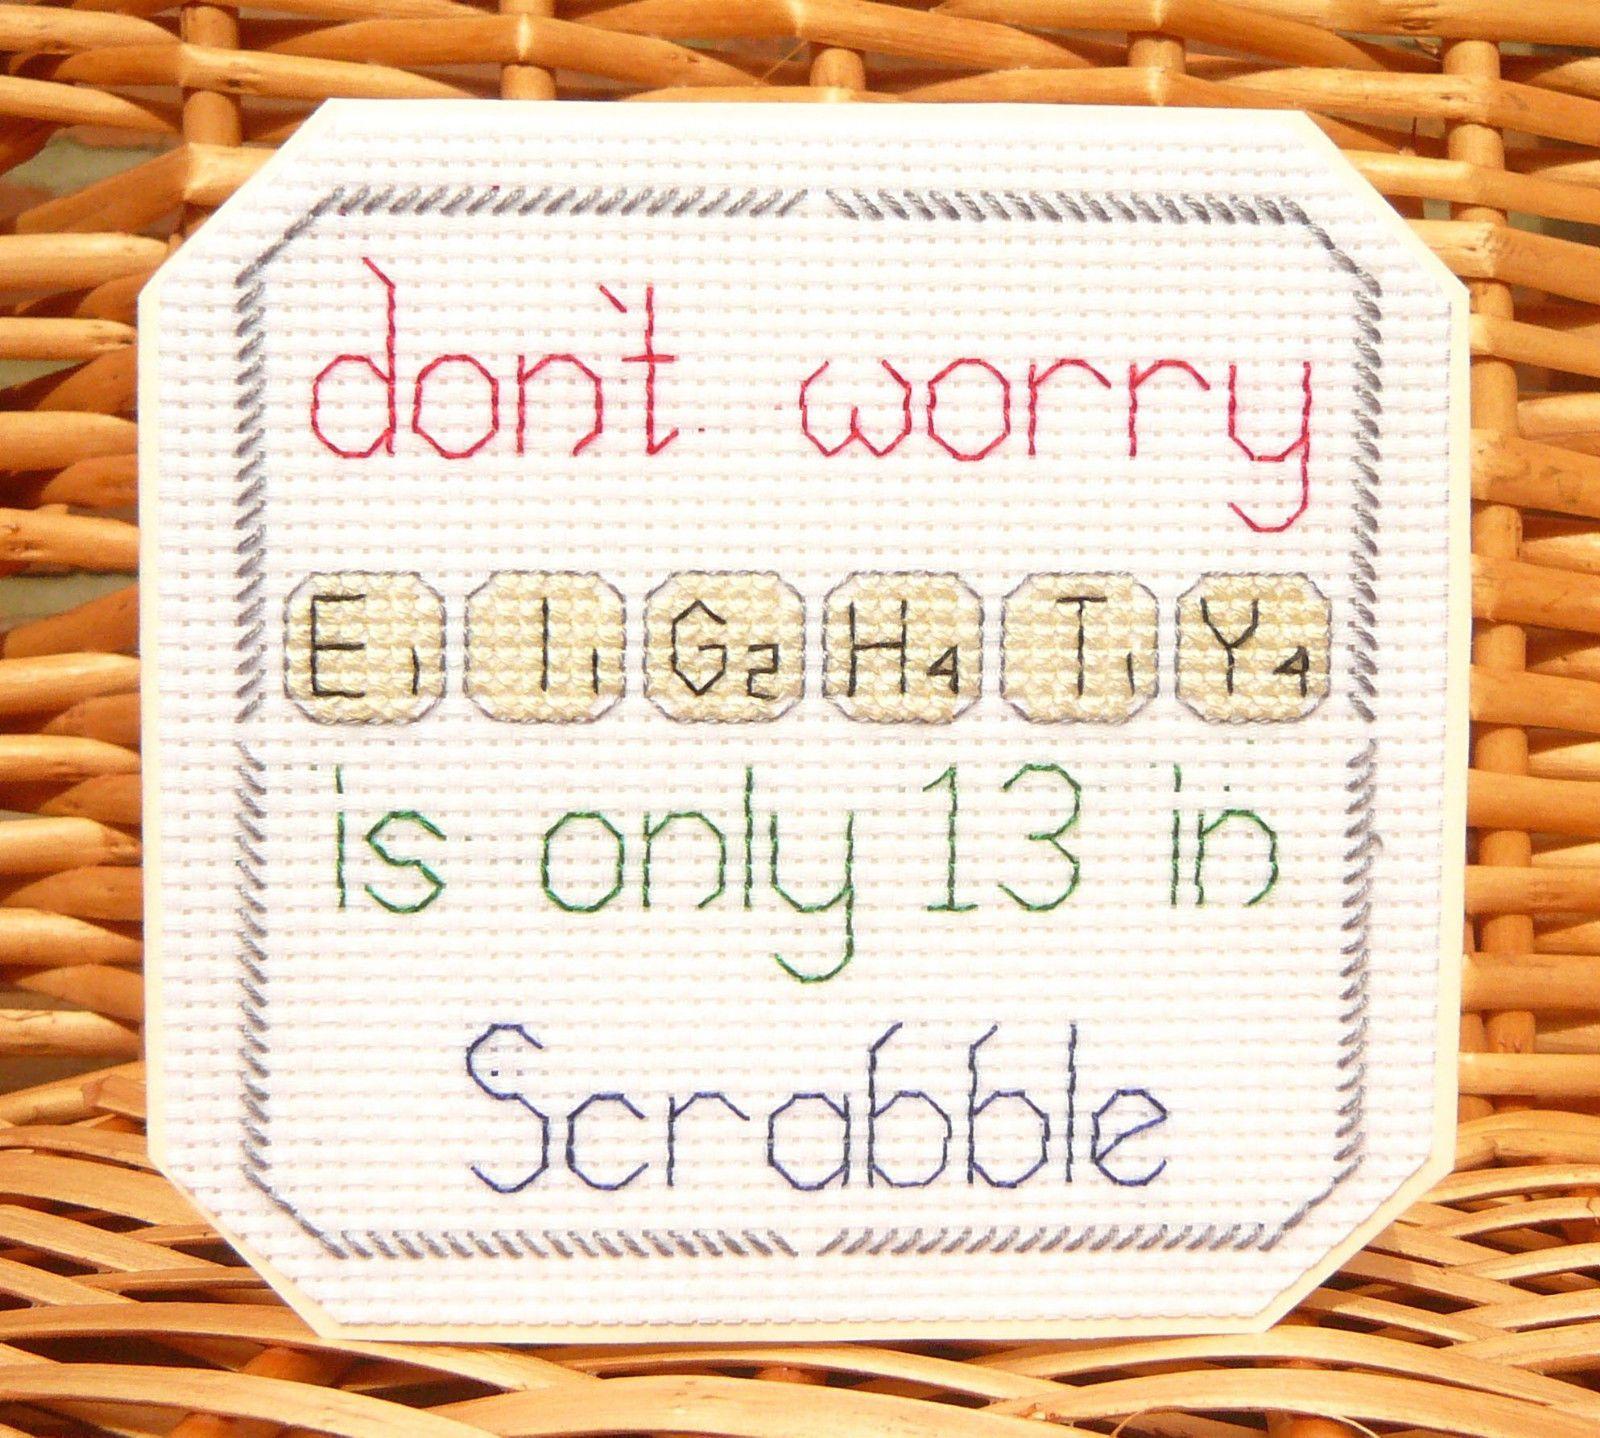 30th, 40th, 50th 60th 70th, 80th & 90th Scrabble Birthday Card⭐️Cross Stitch Kit in Crafts, Cross Stitch, Cross Stitch Kits   eBay